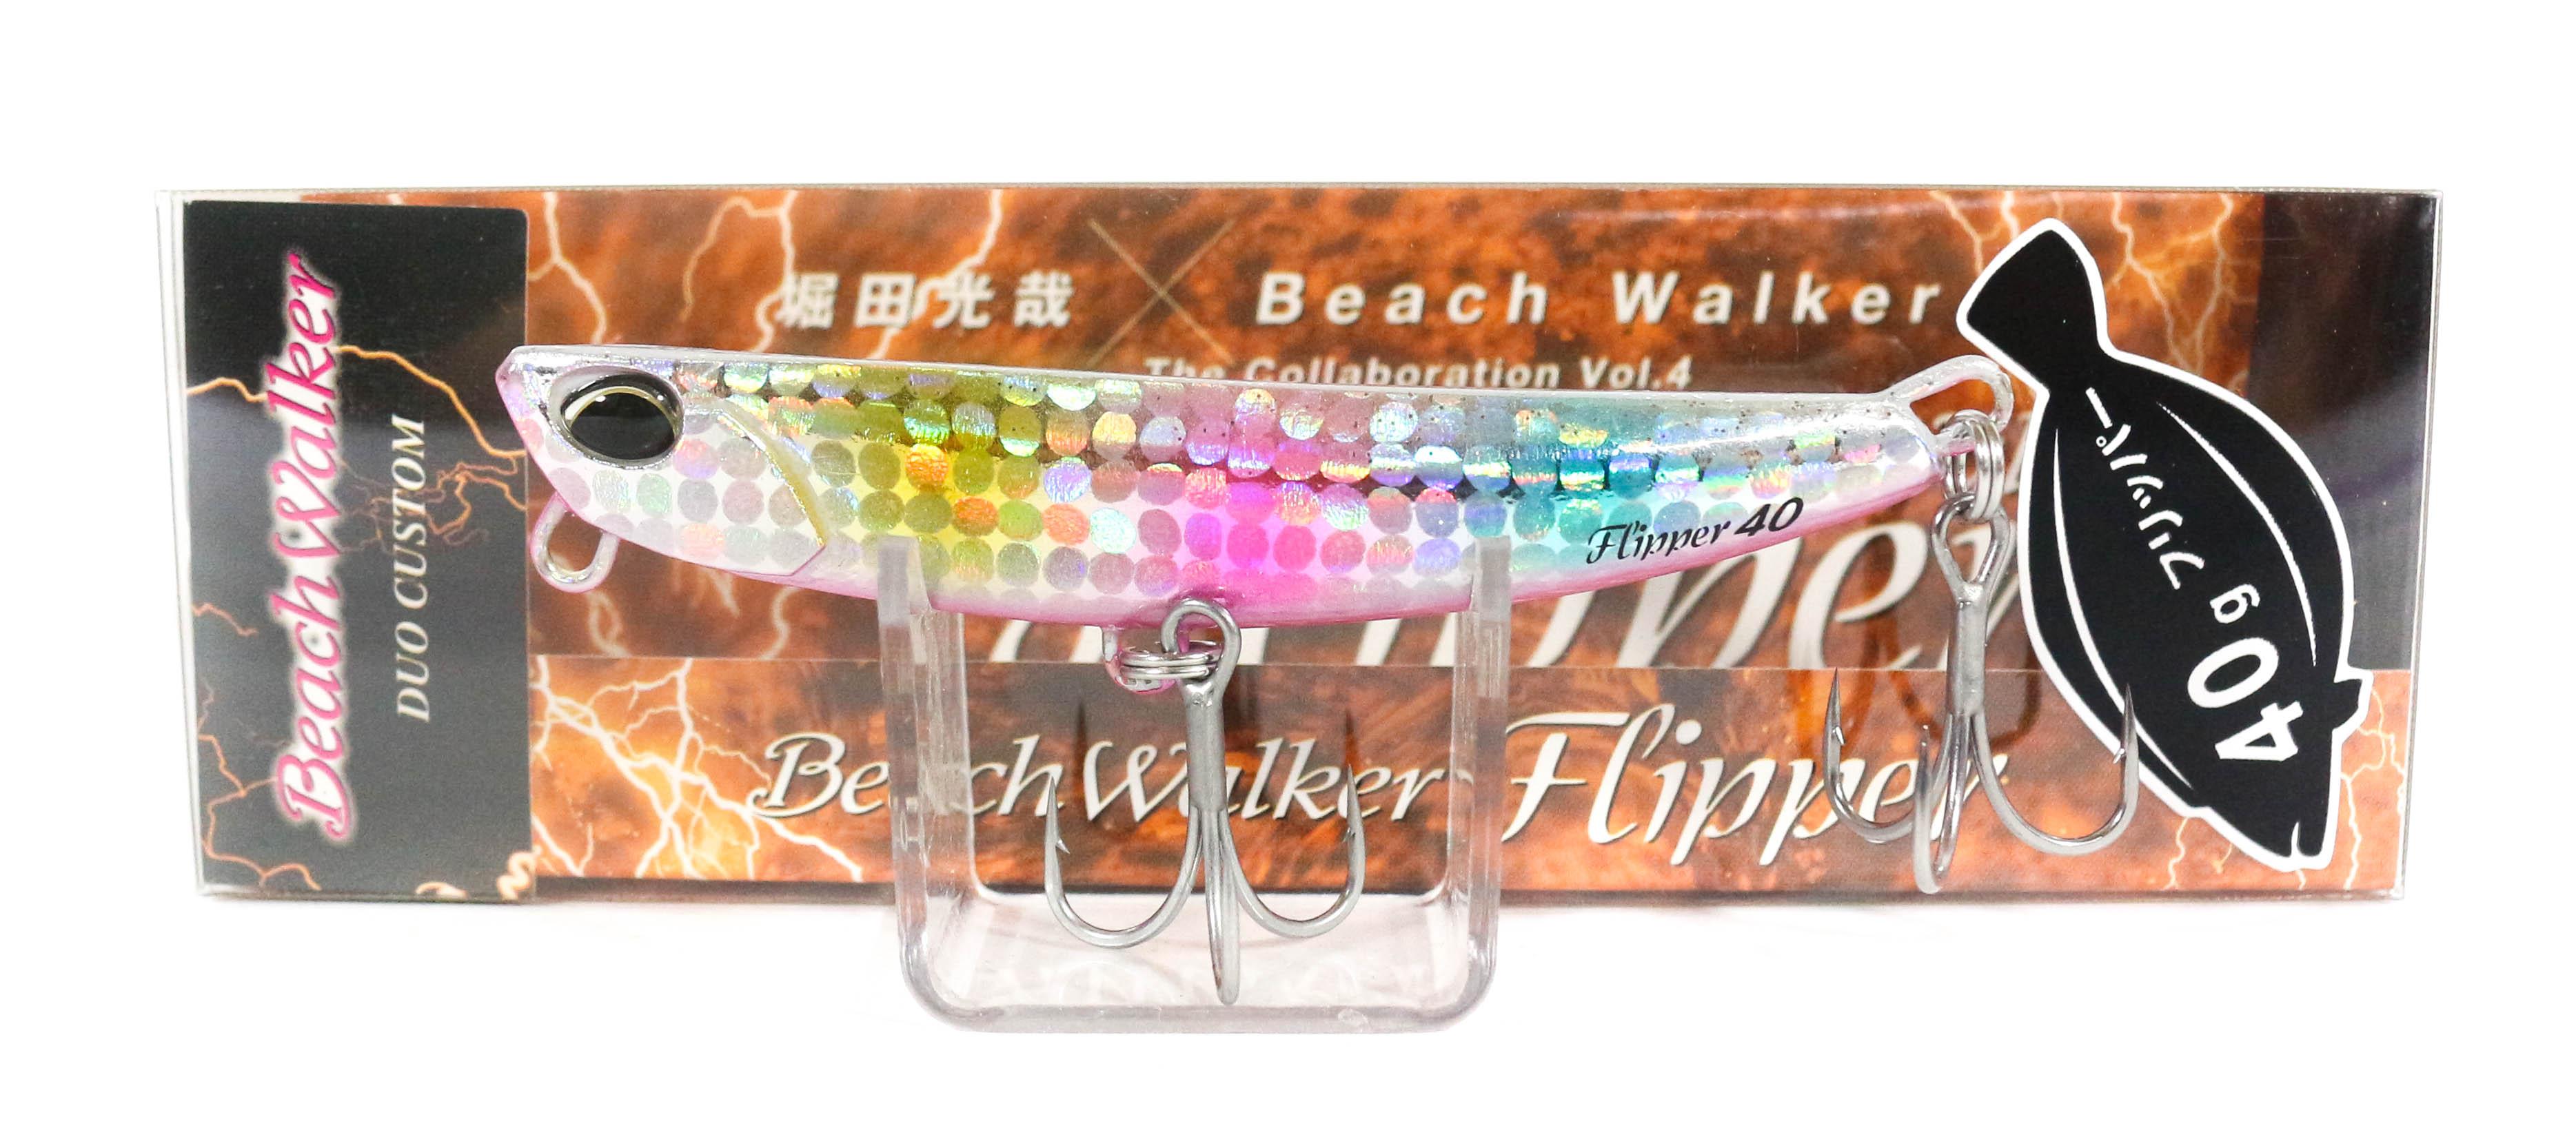 Sale Duo Beach Walker Flipper 40 grams Sinking Lure GQA0184 (4011)